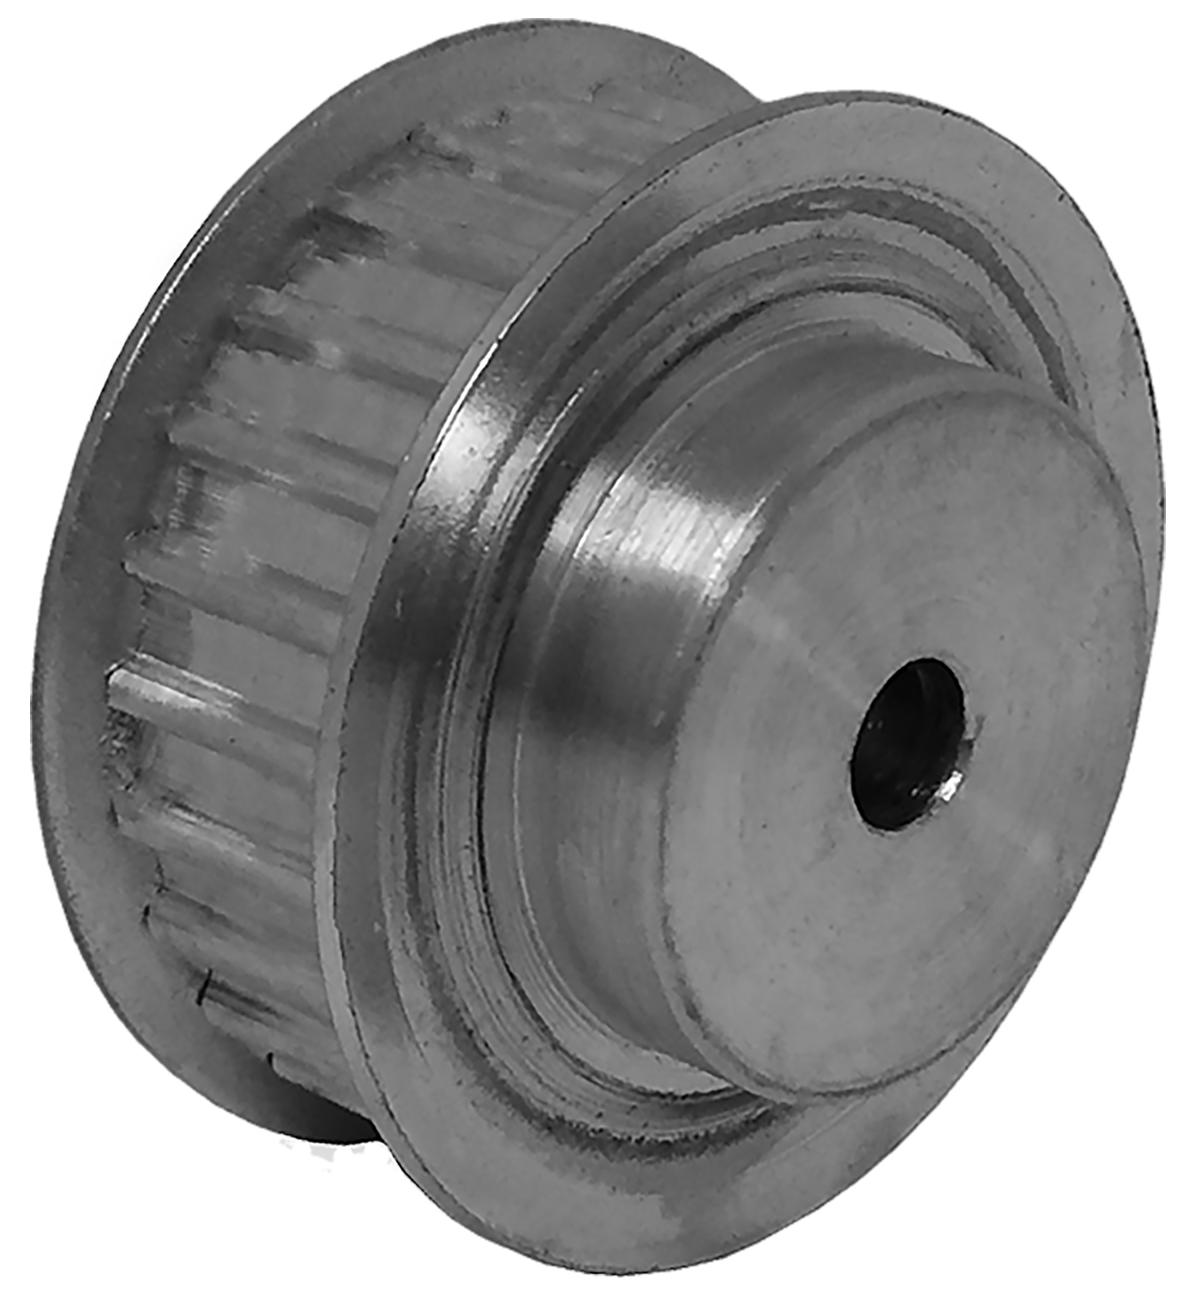 21AT5/25-2 - Aluminum Metric Pulleys